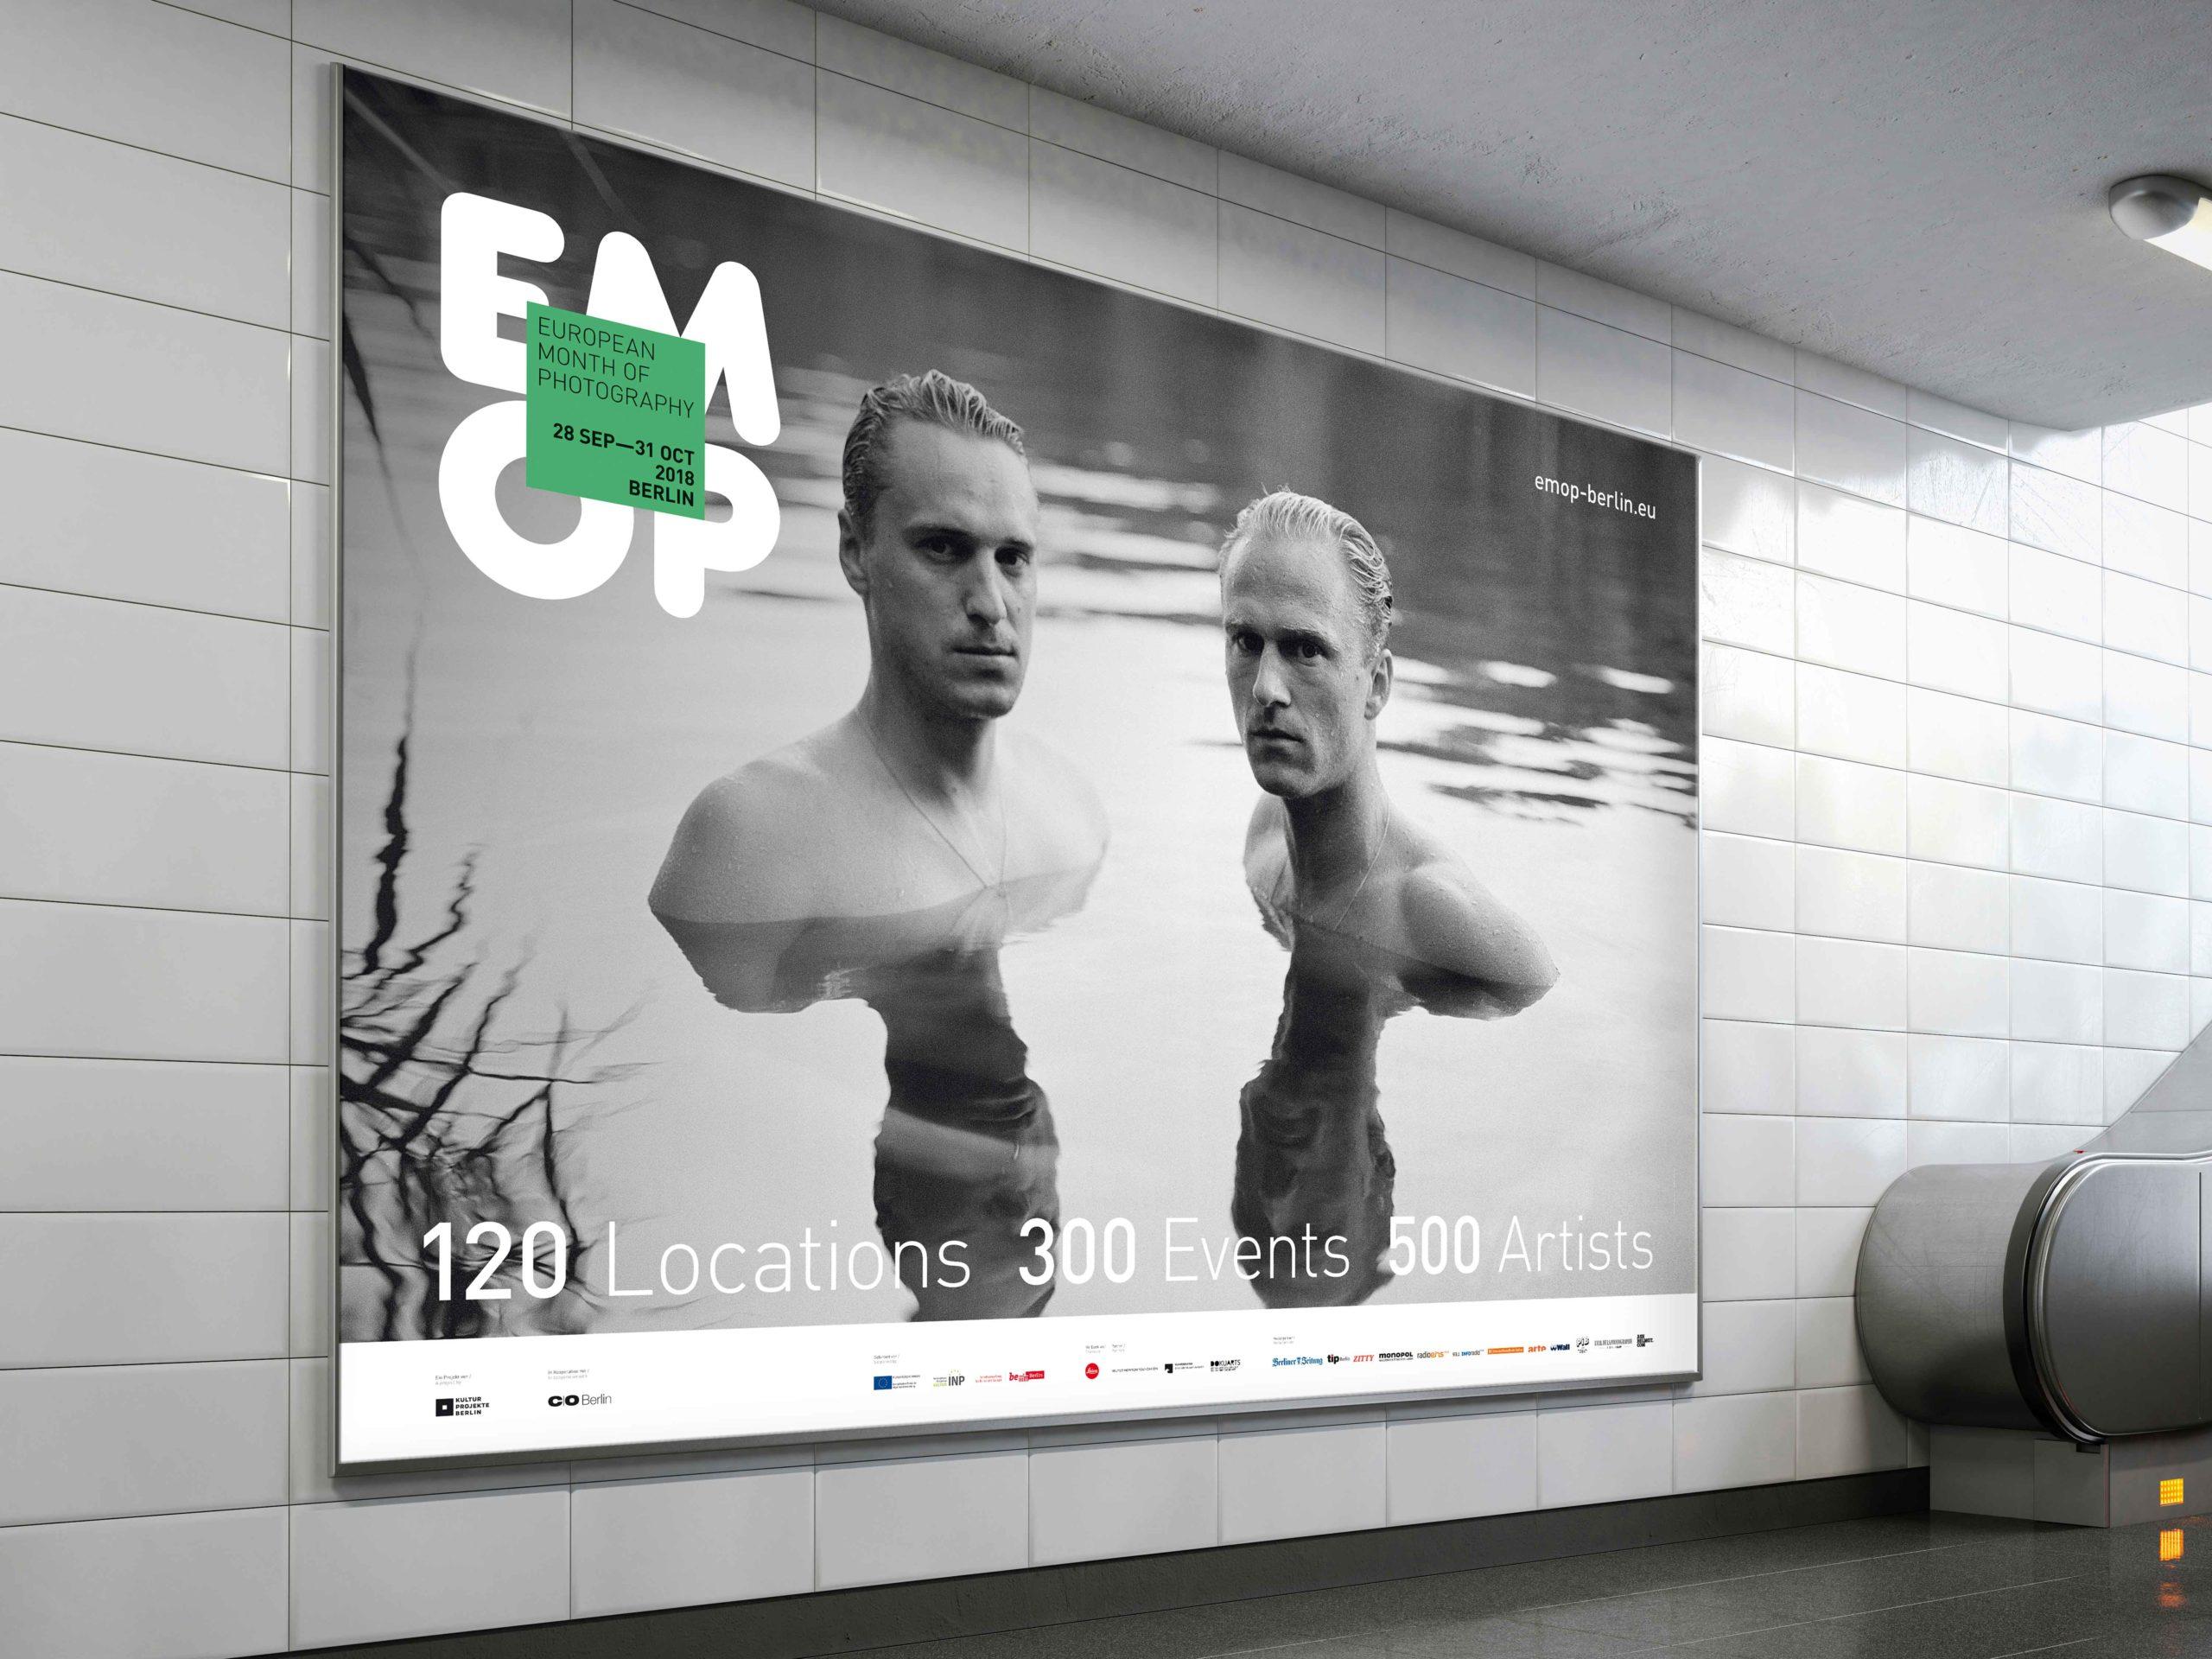 Big billboard in the bright subway. 3d rendering